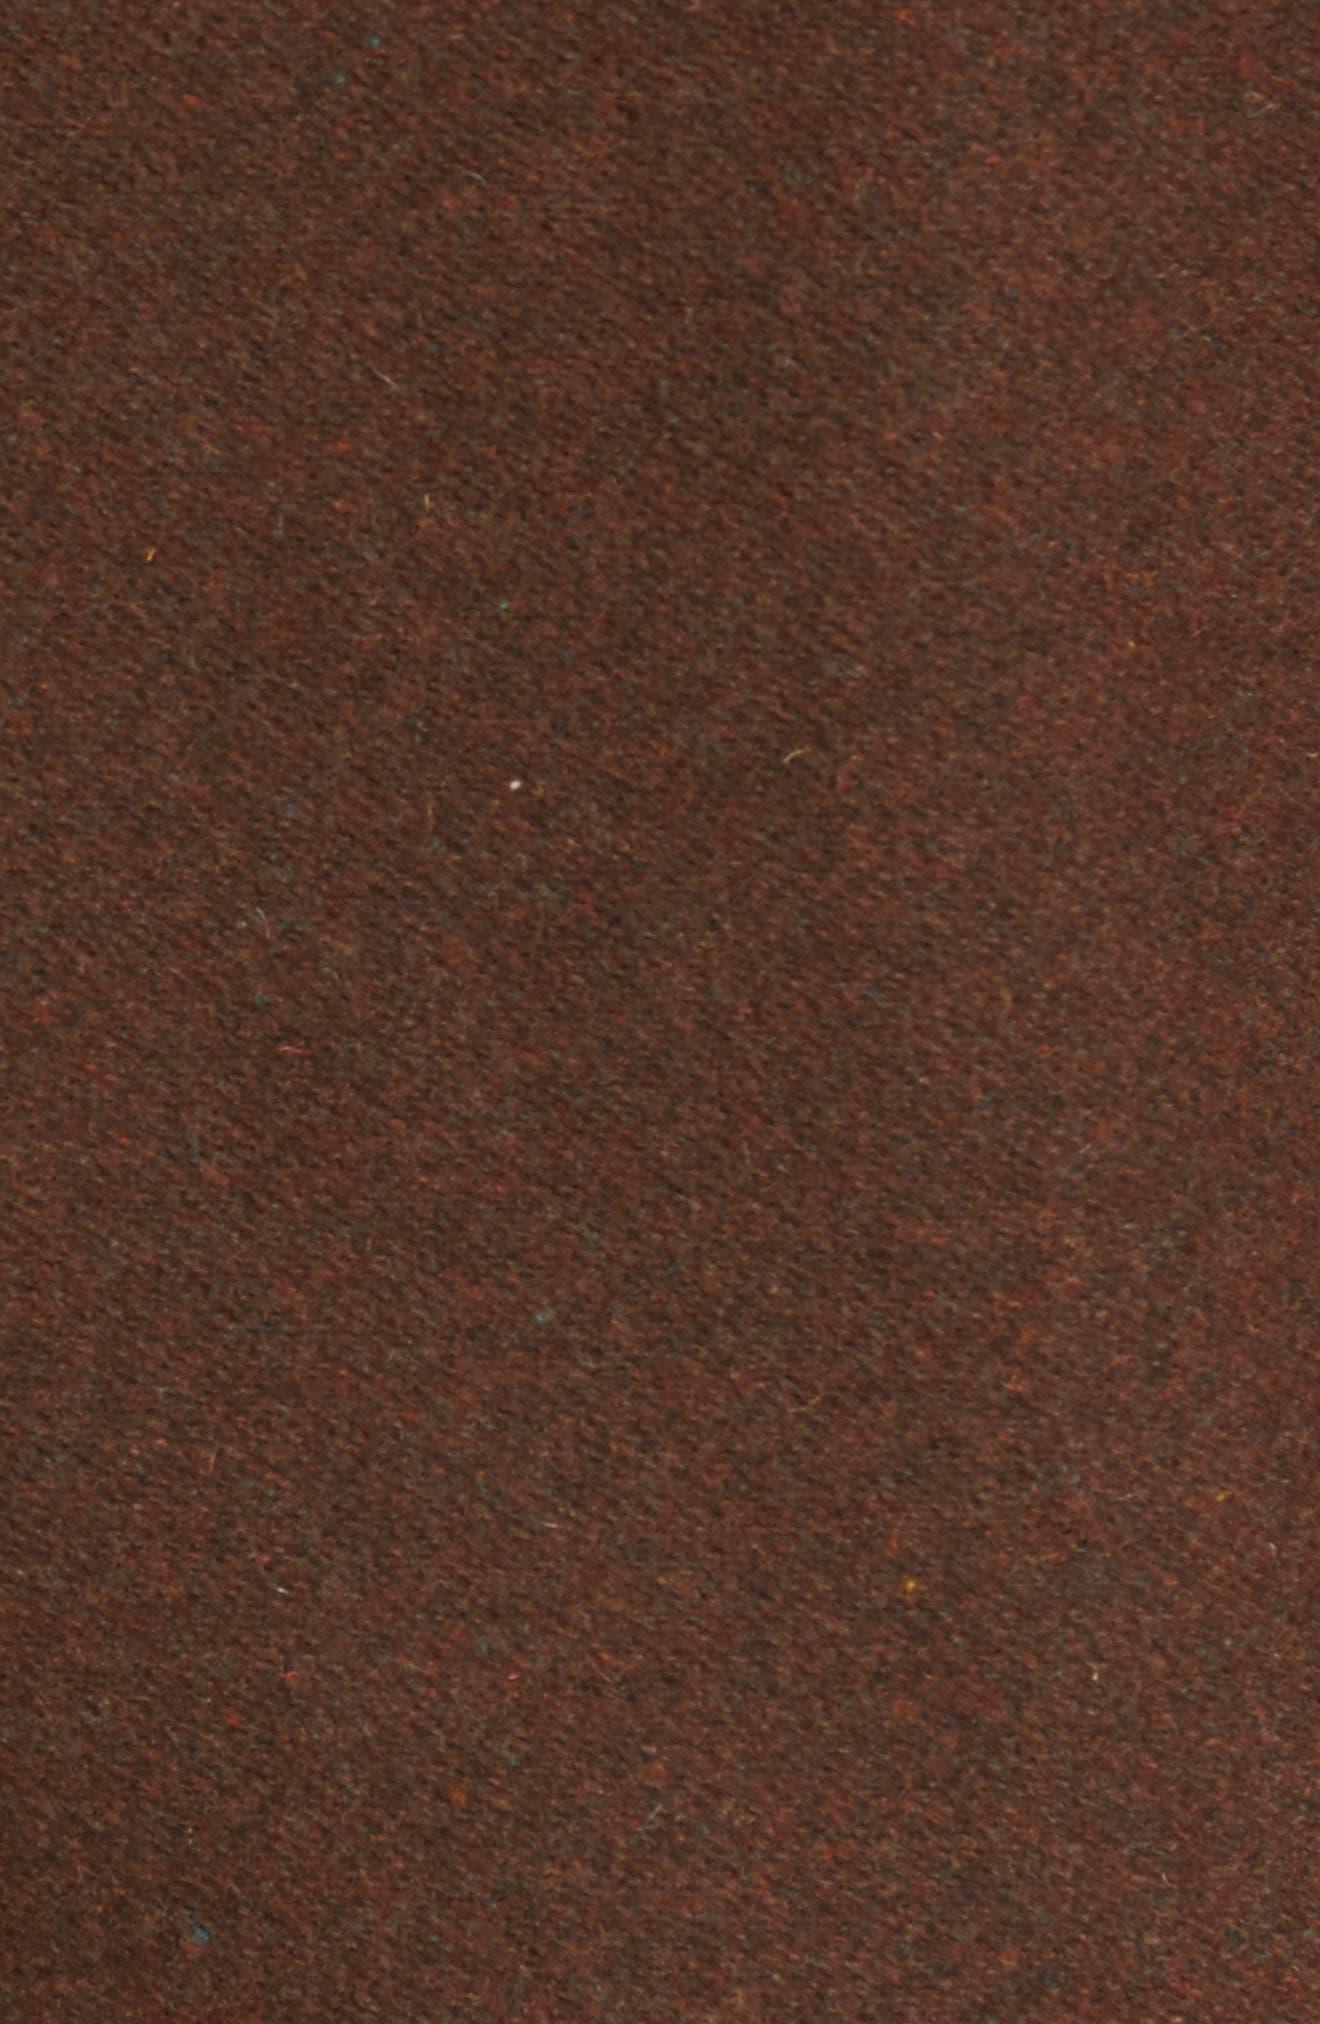 Liberty Wool Blend Zip Front Jacket,                             Alternate thumbnail 5, color,                             Brown